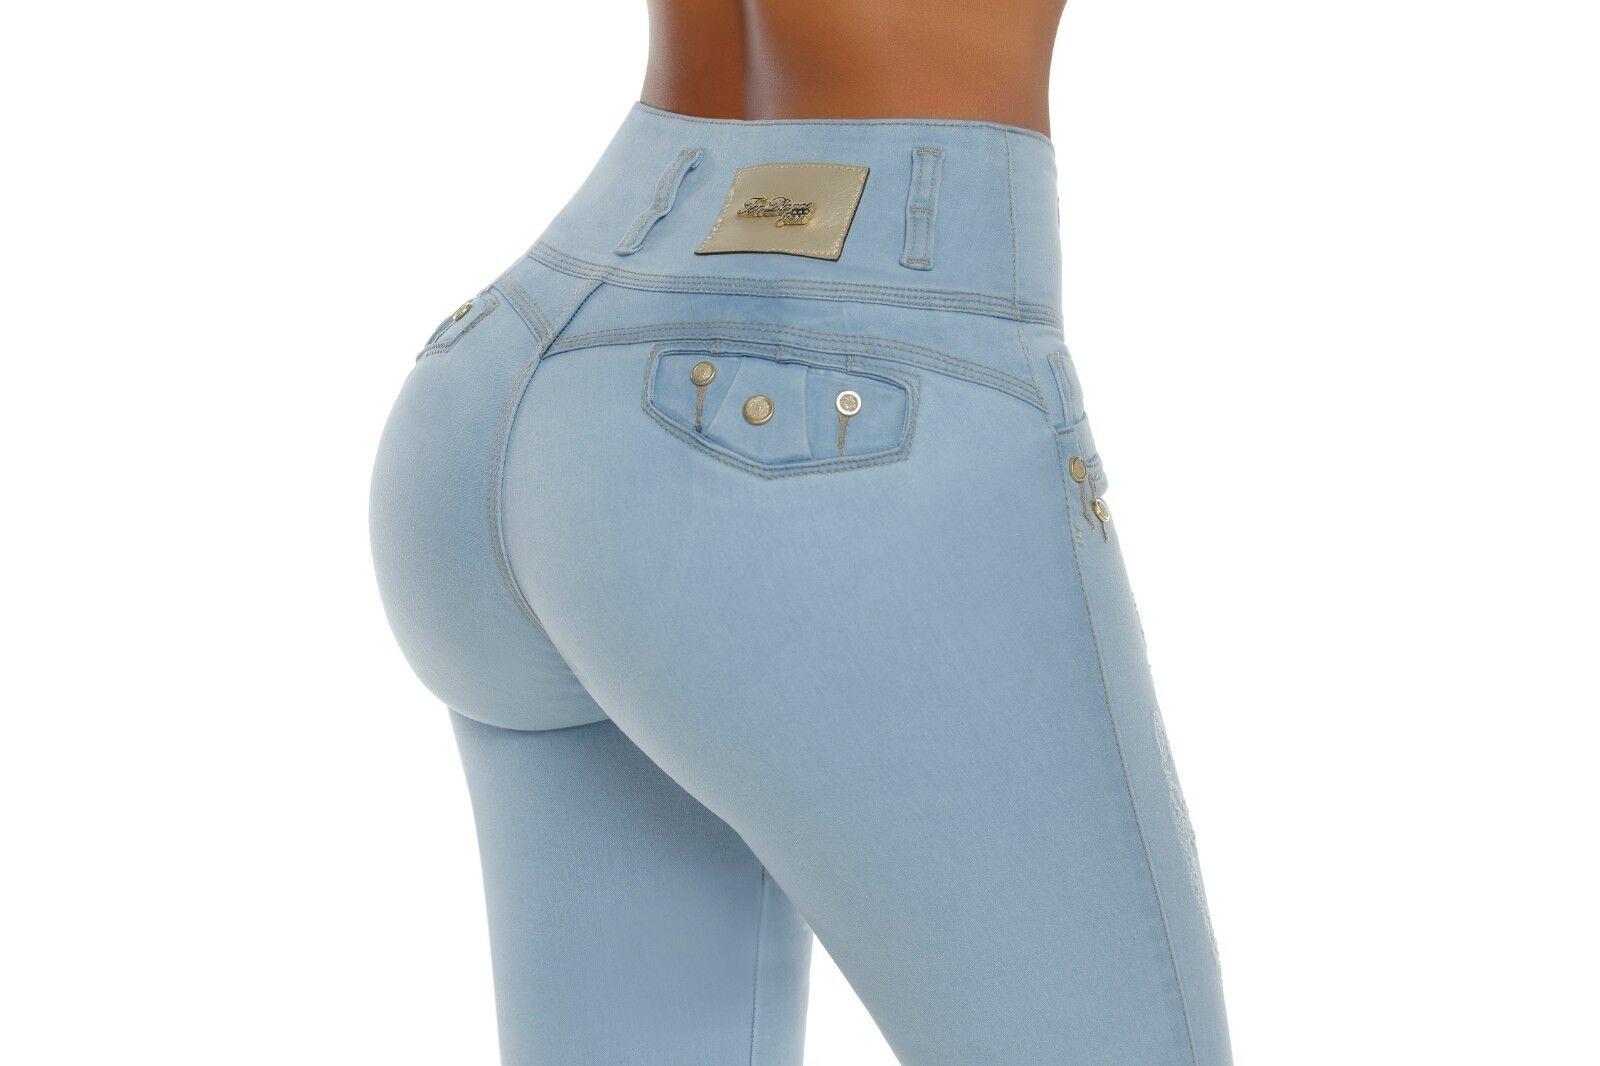 Jeans Colombianos levantacola push up Butt lifter fajas levanta pompi 1257